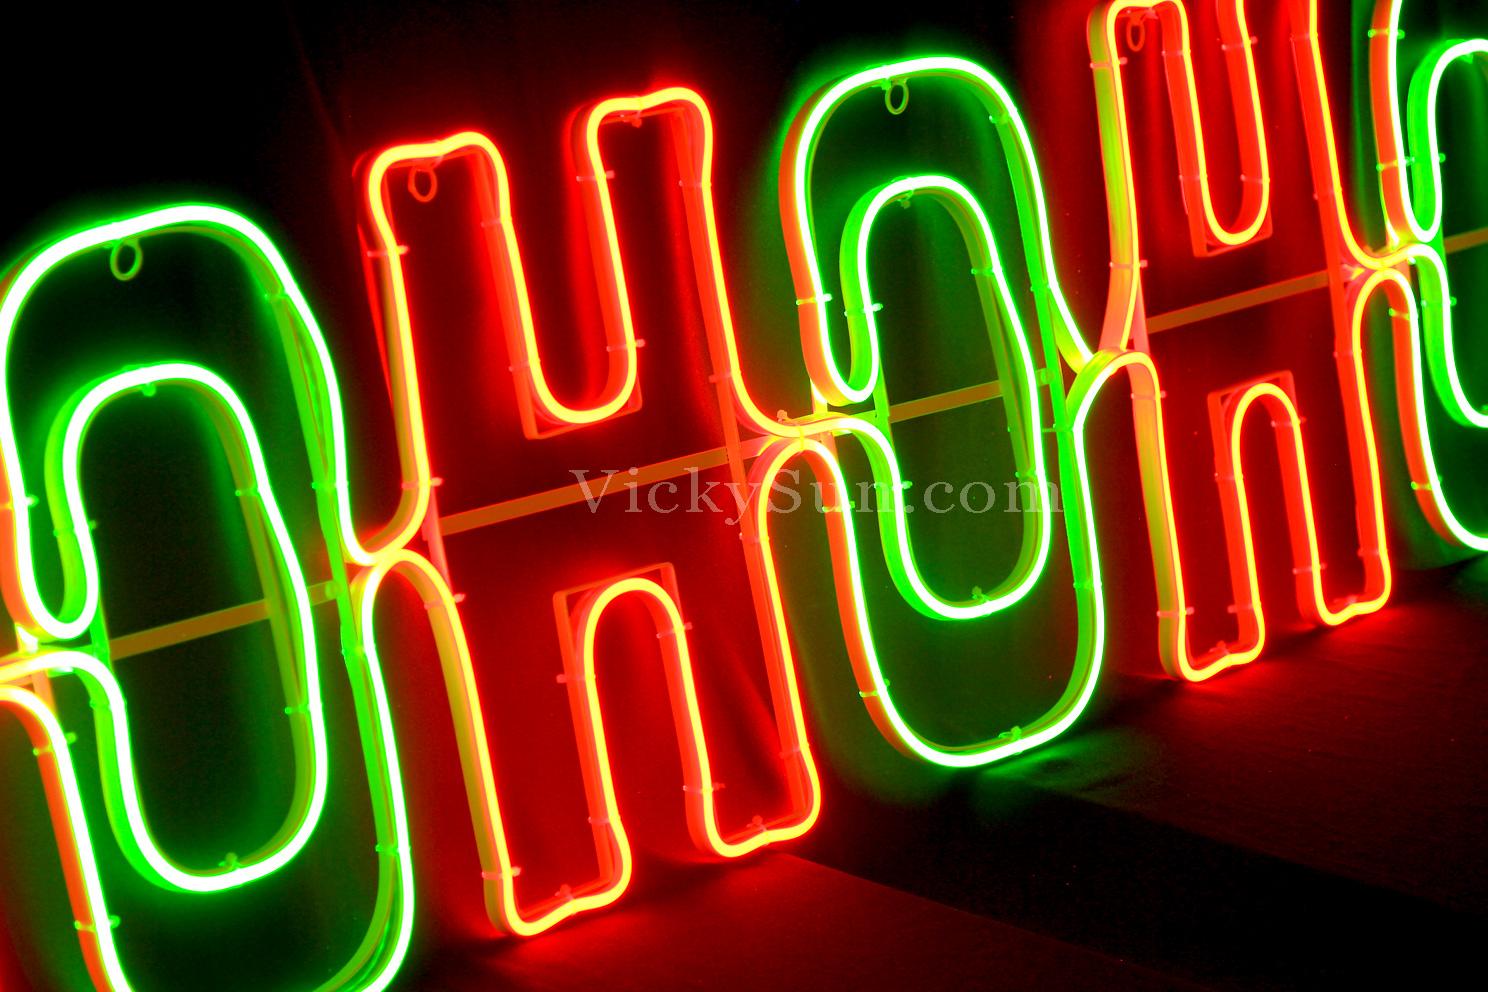 150cm-led-red-green-neon-hohoho-lights-zxdn19115rgb.jpg